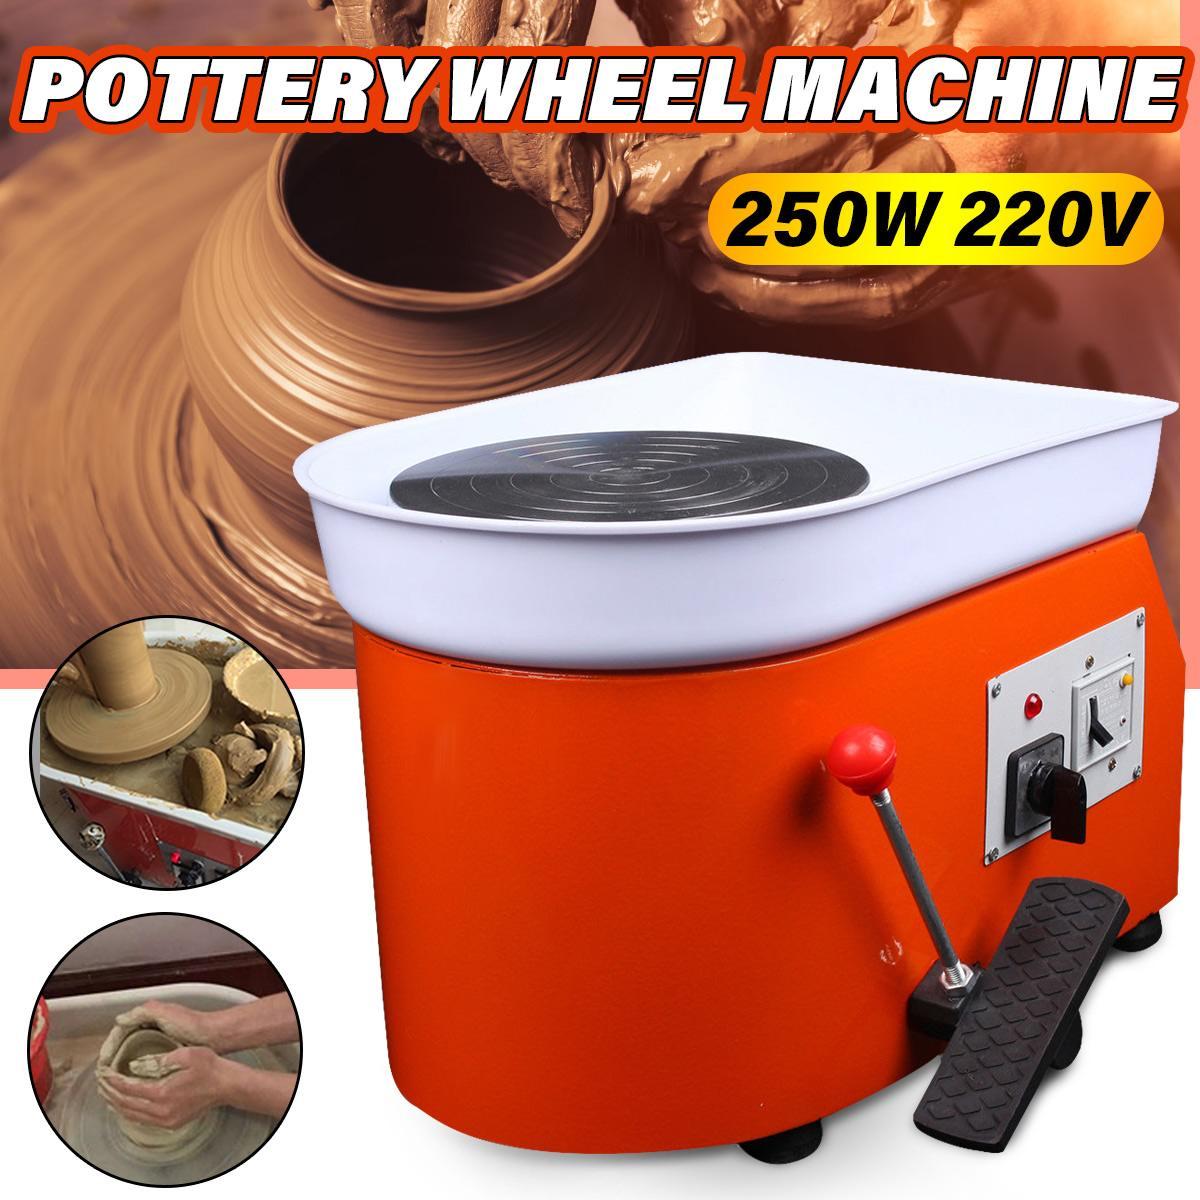 250W 220V Electric Pottery Wheel Ceramic Machine Tools Foot Pedal Ceramic Clay Kit Art Mold DIY Turning Ceramic Forming Machine